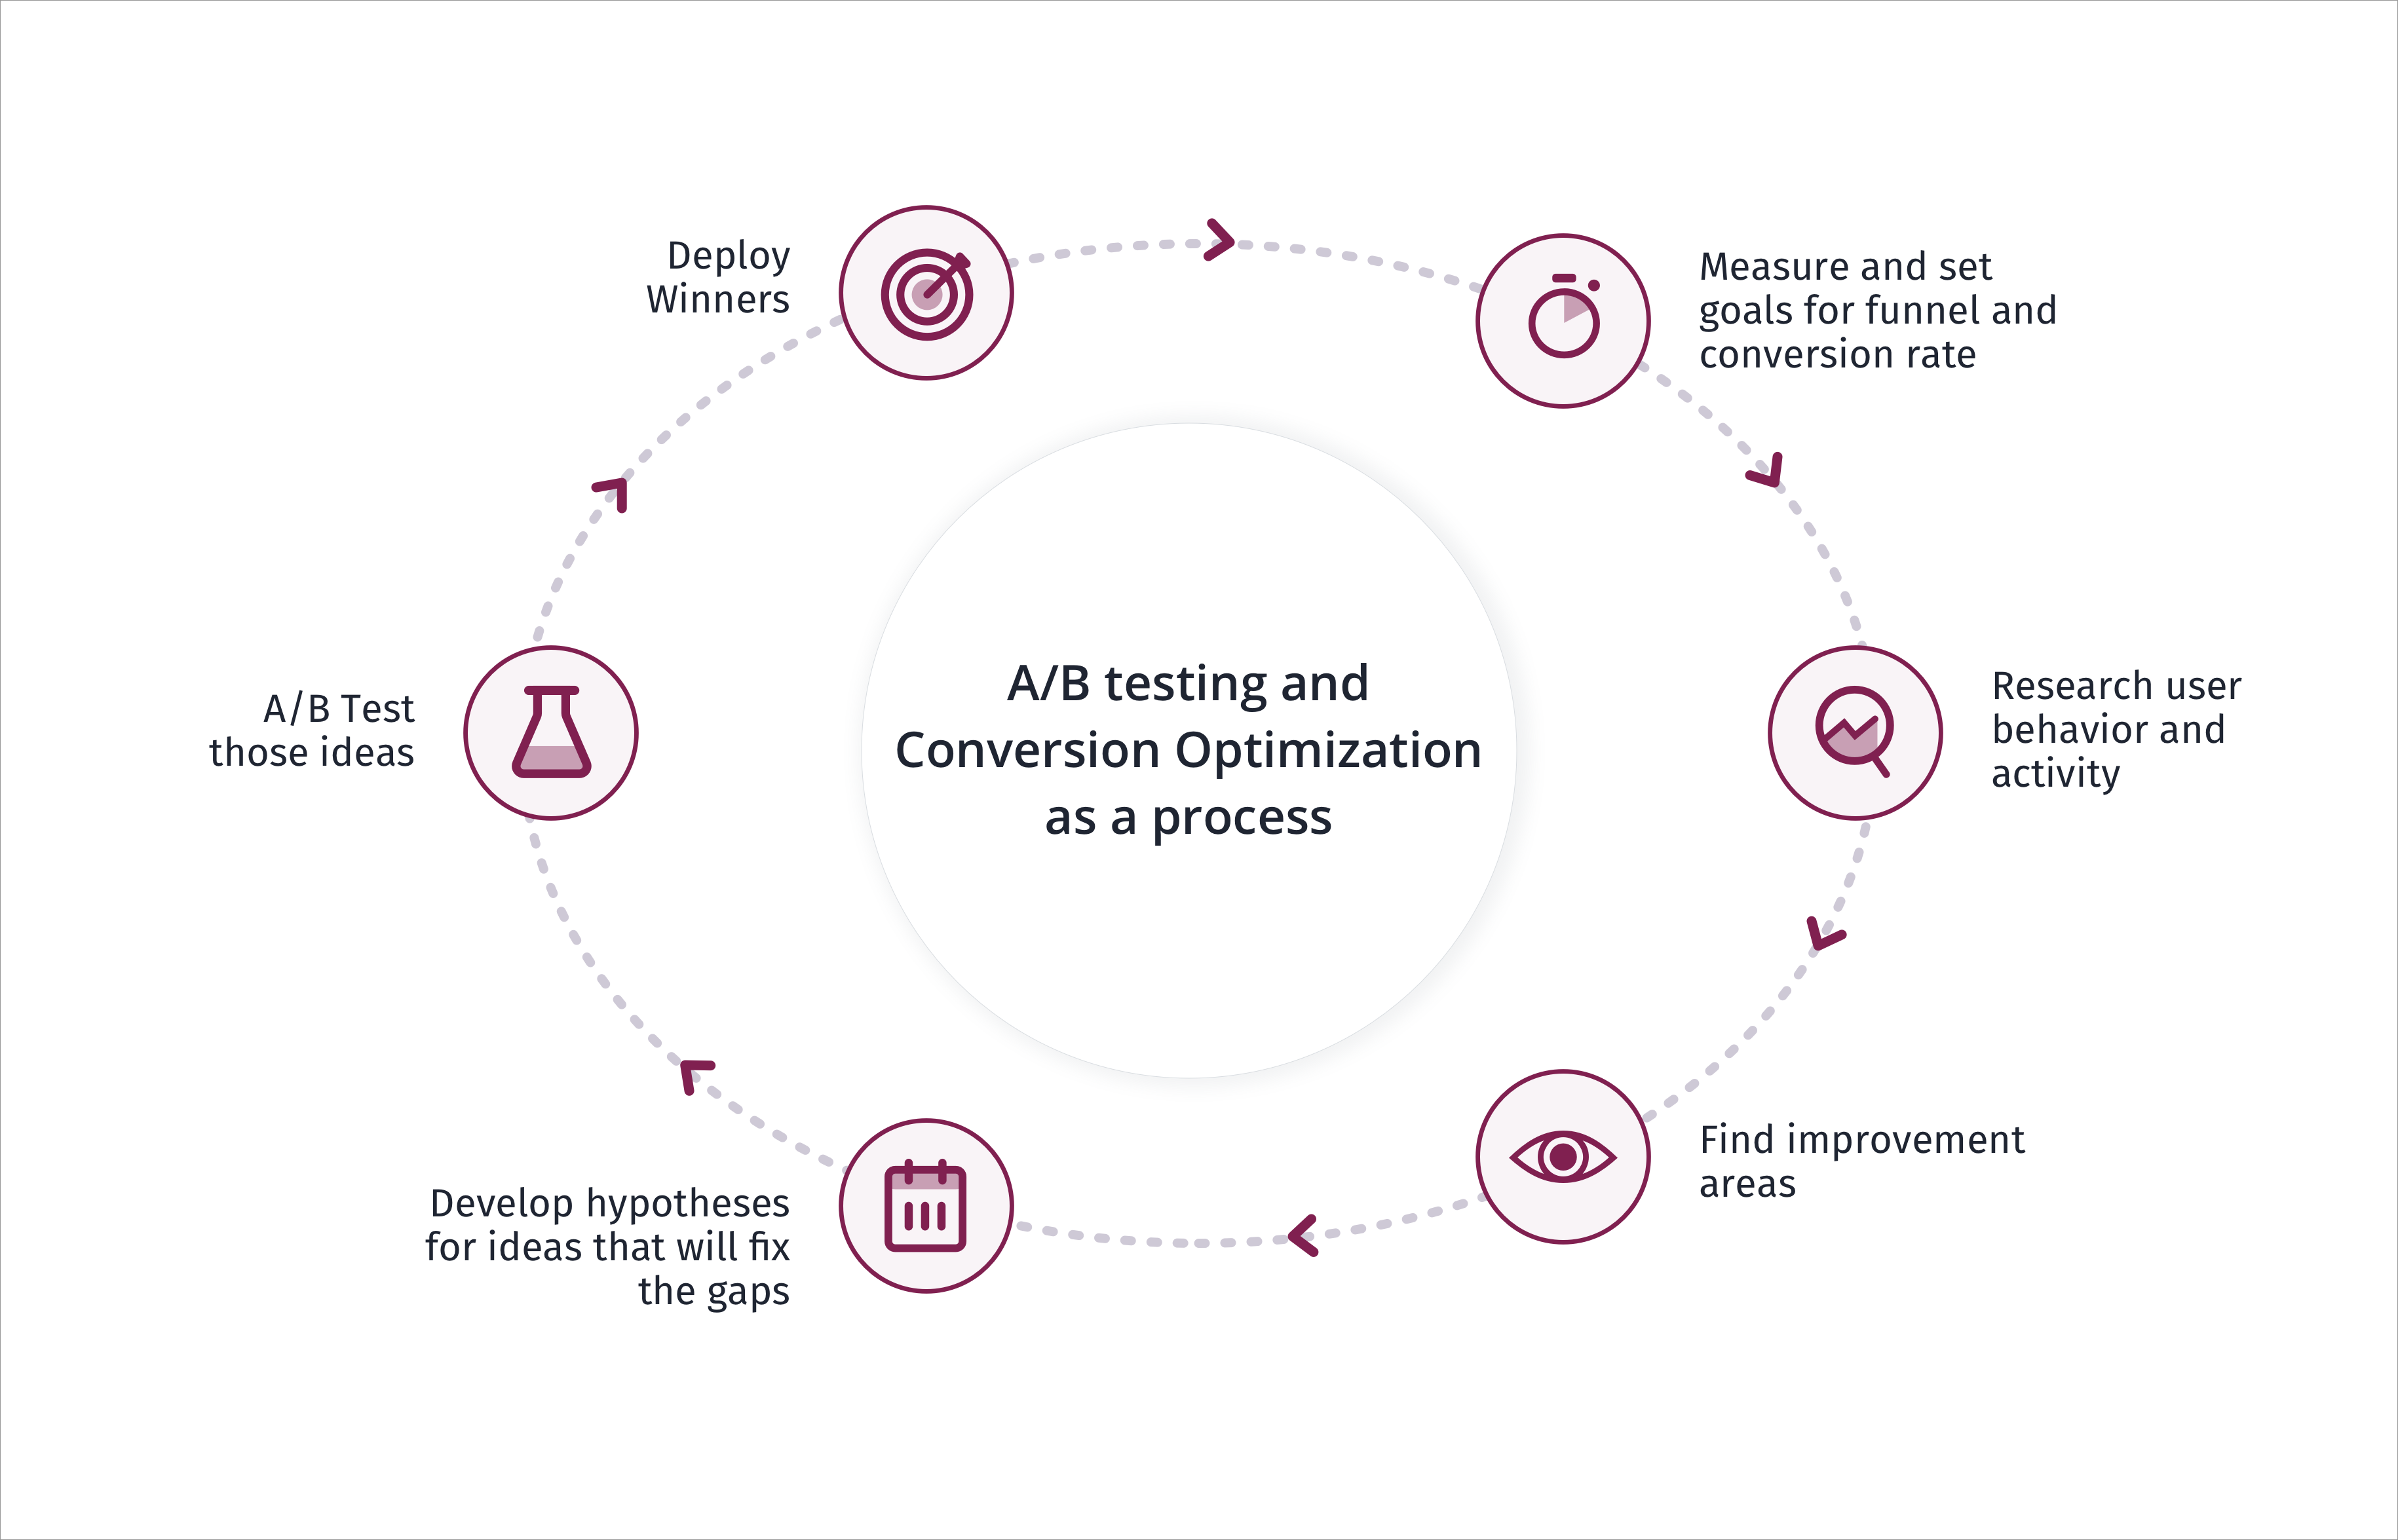 A/B Testing and Conversion Optimization ad a process